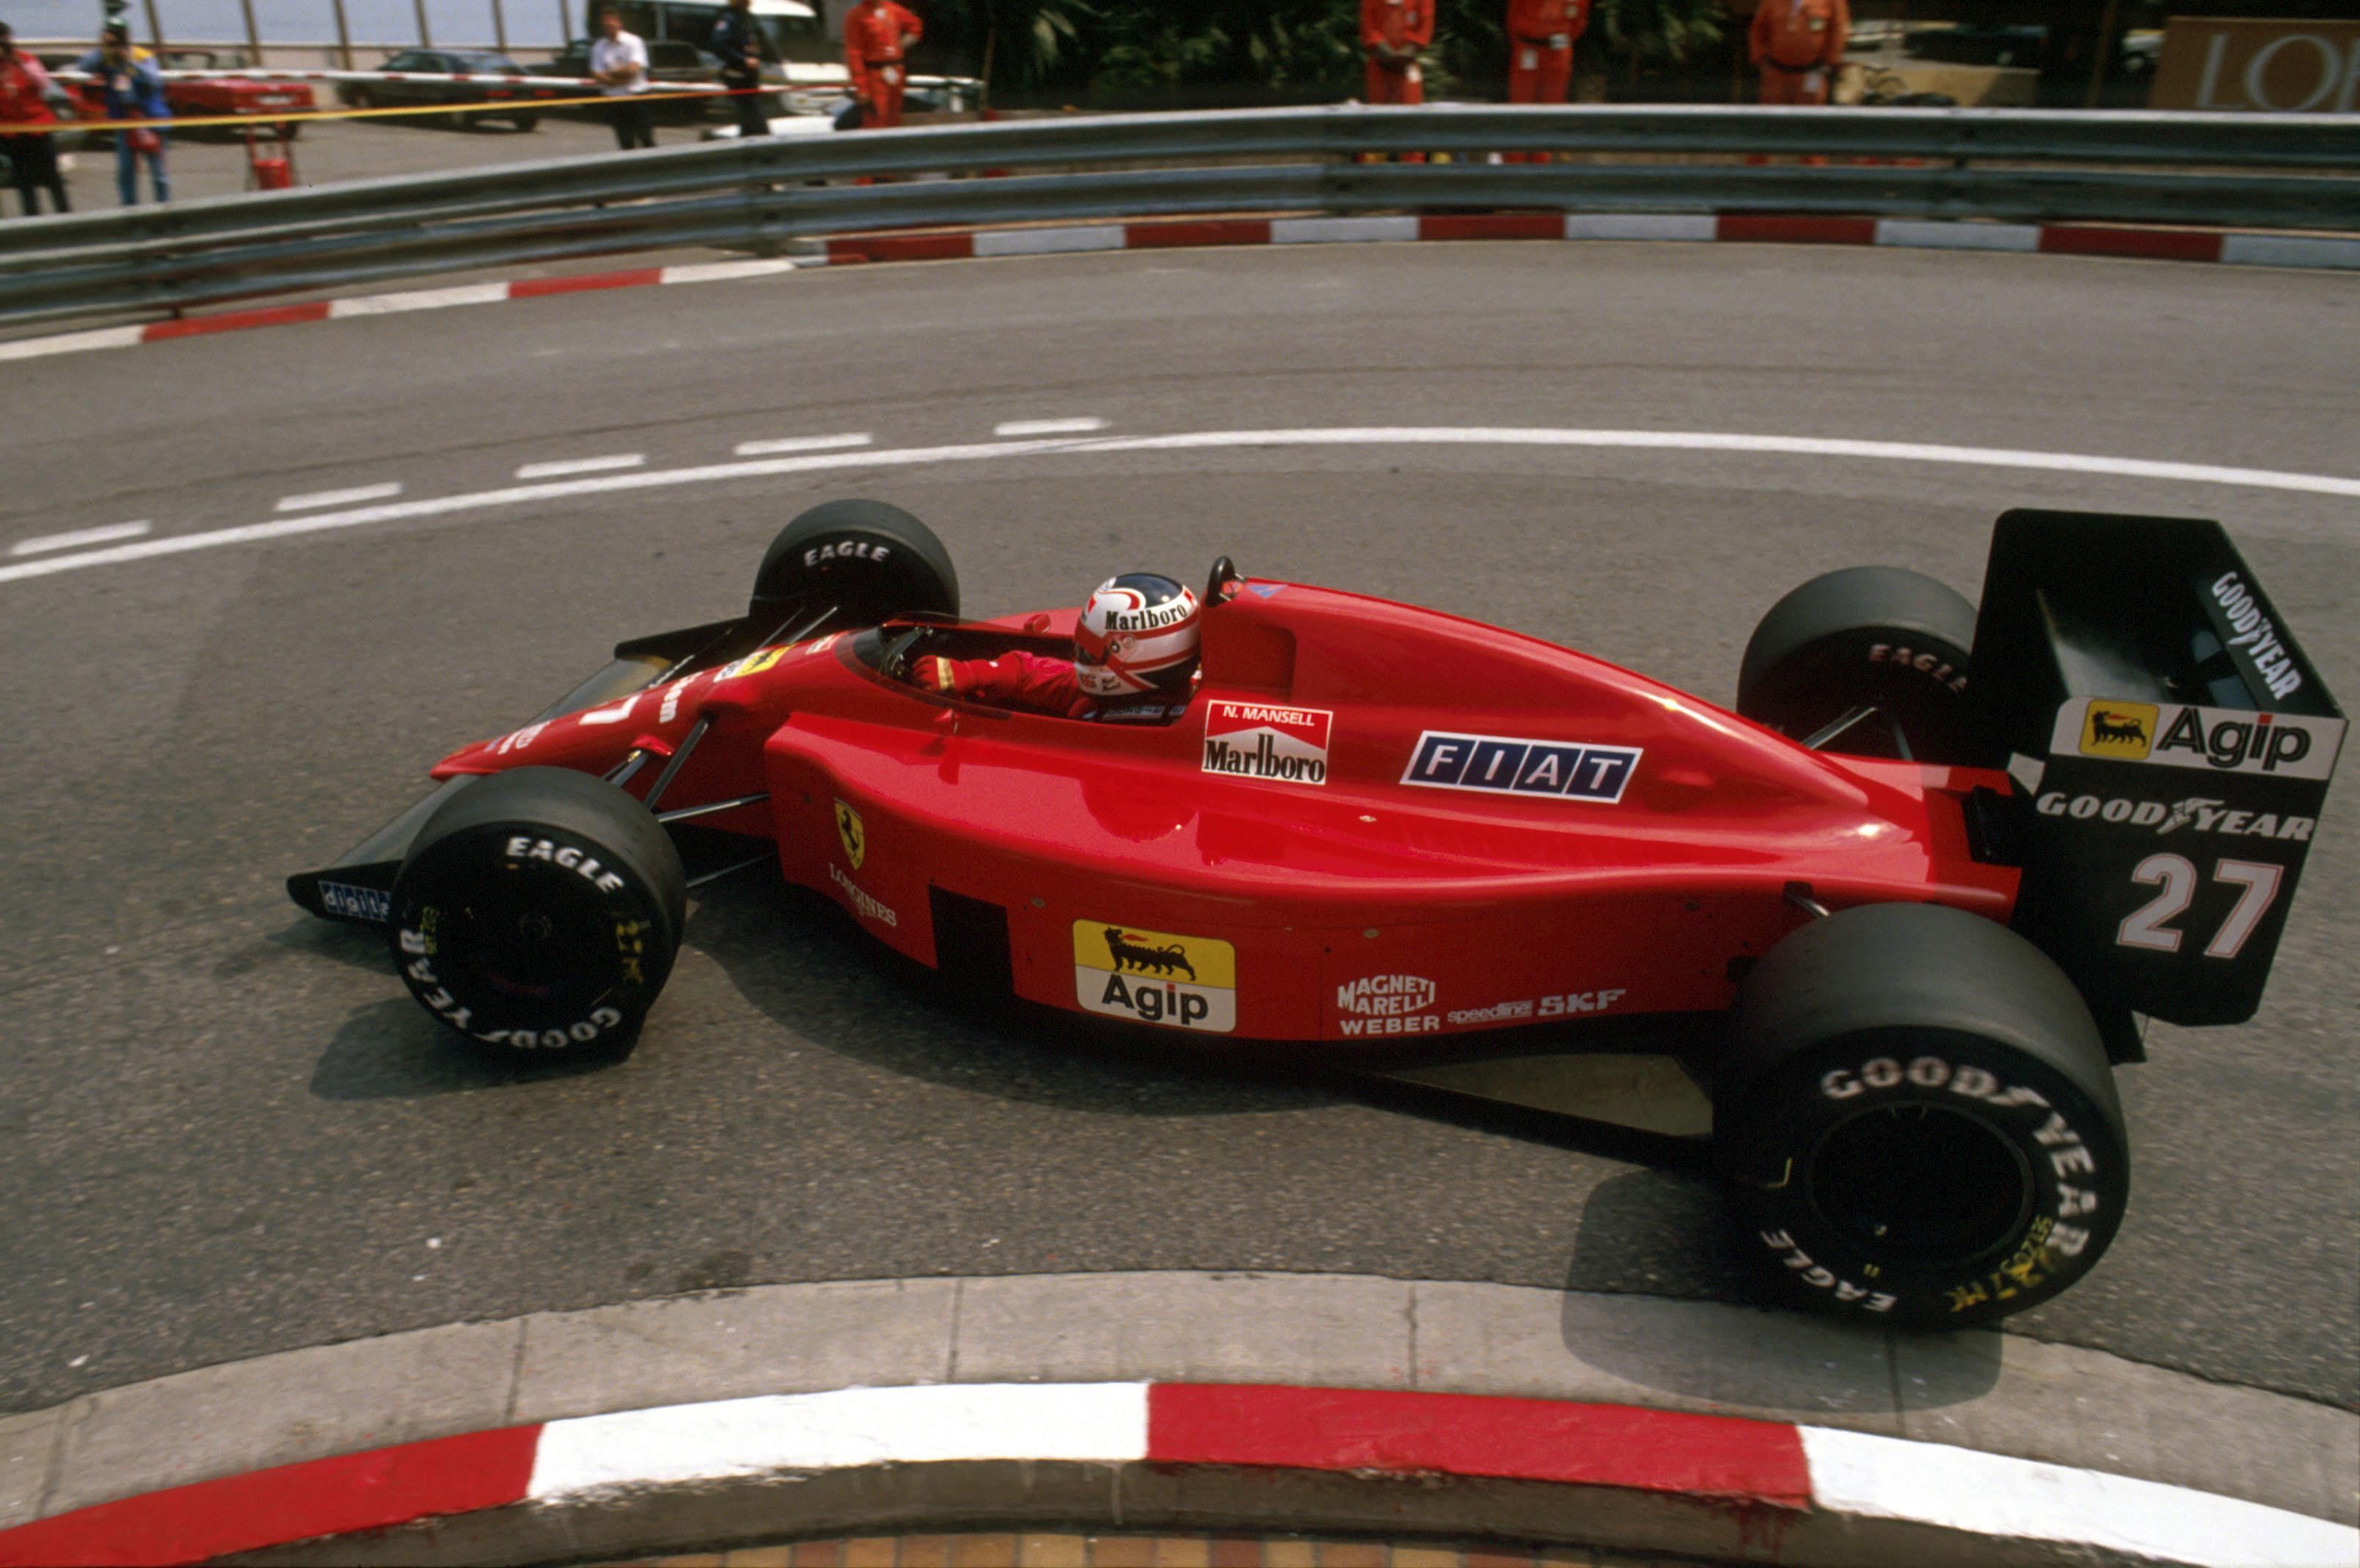 Sequential Sorrow 1989 Ferrari 640